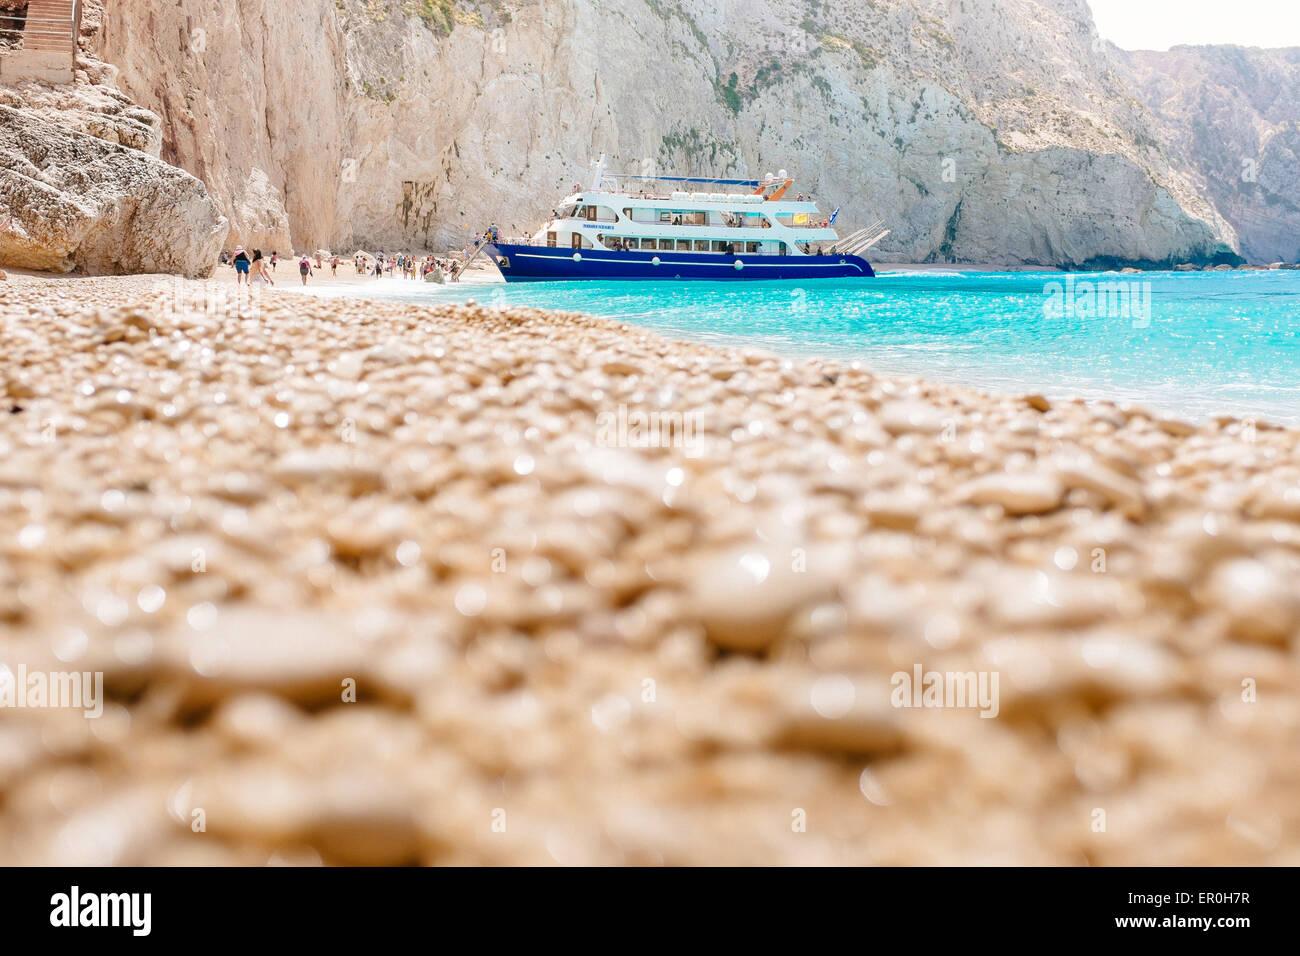 Porto Katsiki beach with tourist ship, Lefkada island, Greece - Stock Image